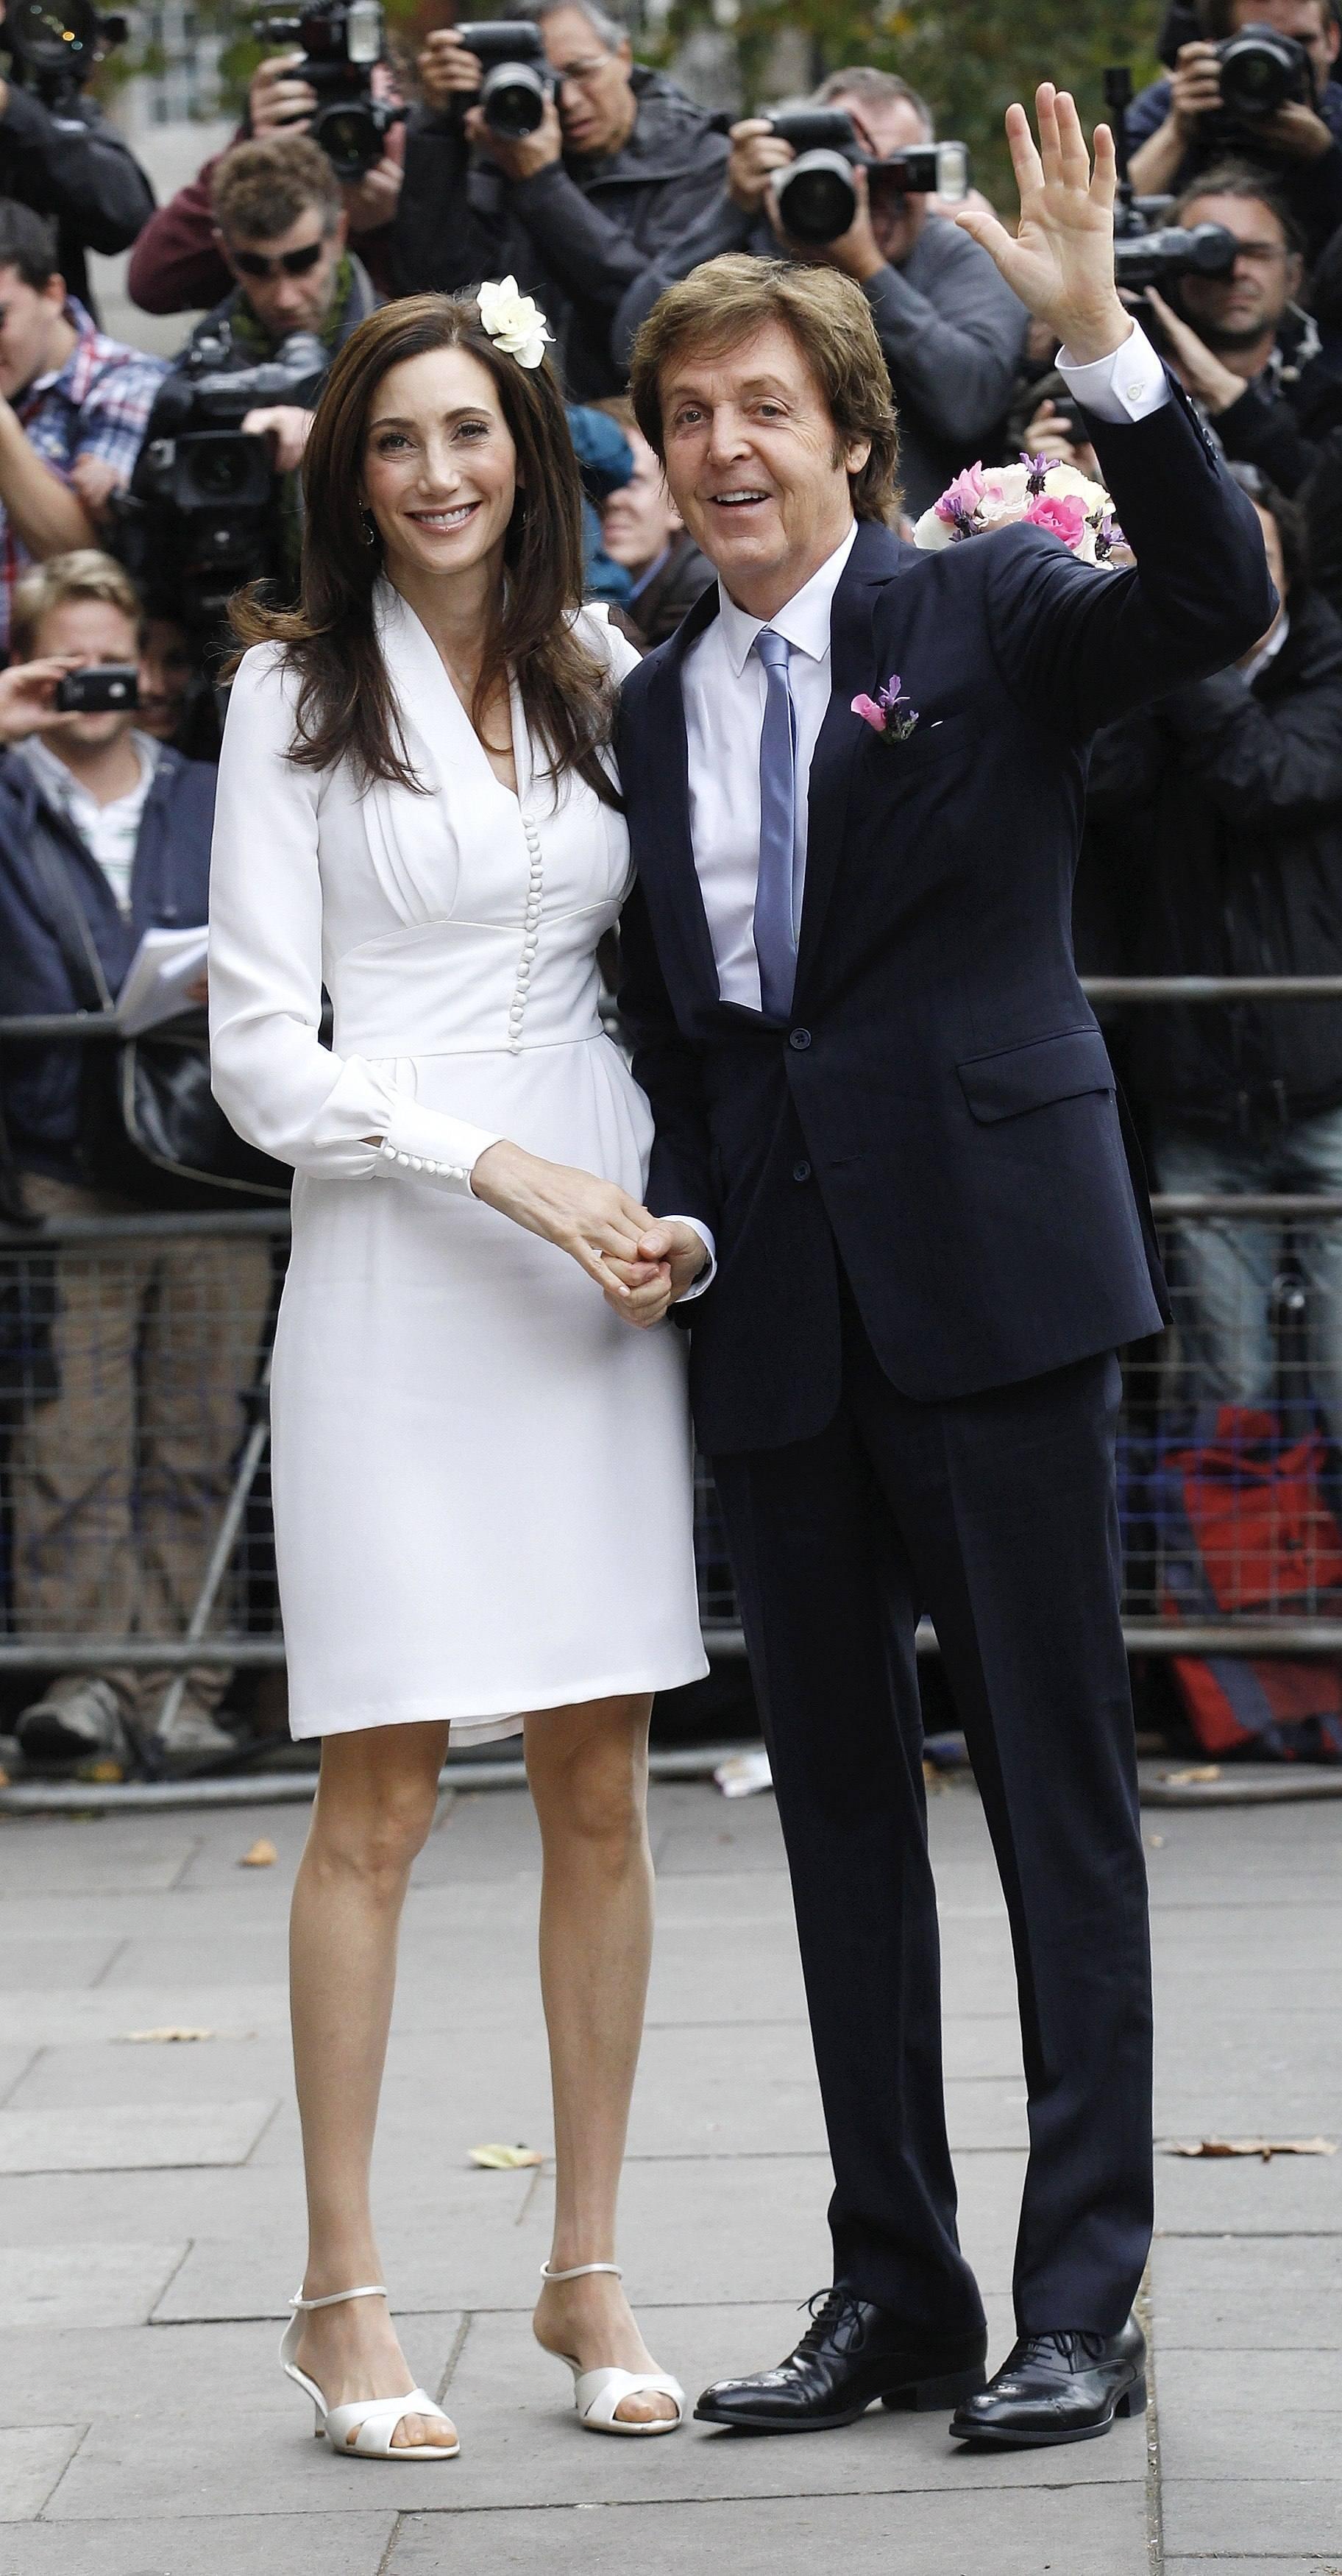 Paul McCartney marries Nancy Shevell